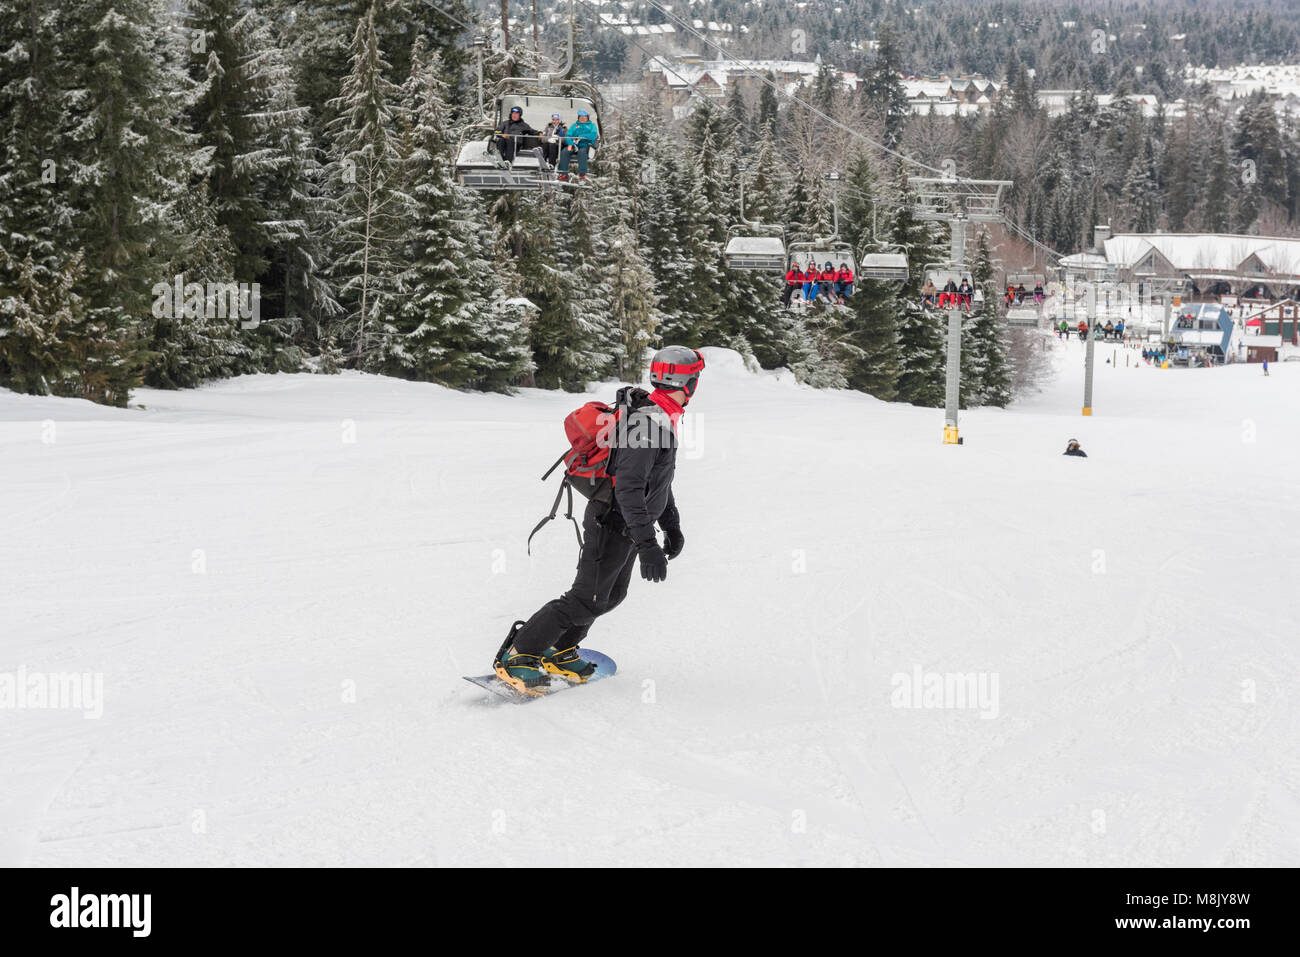 Snowboarder heading down the run at  Whistler Blackcomb ski resort, British Columbia. - Stock Image